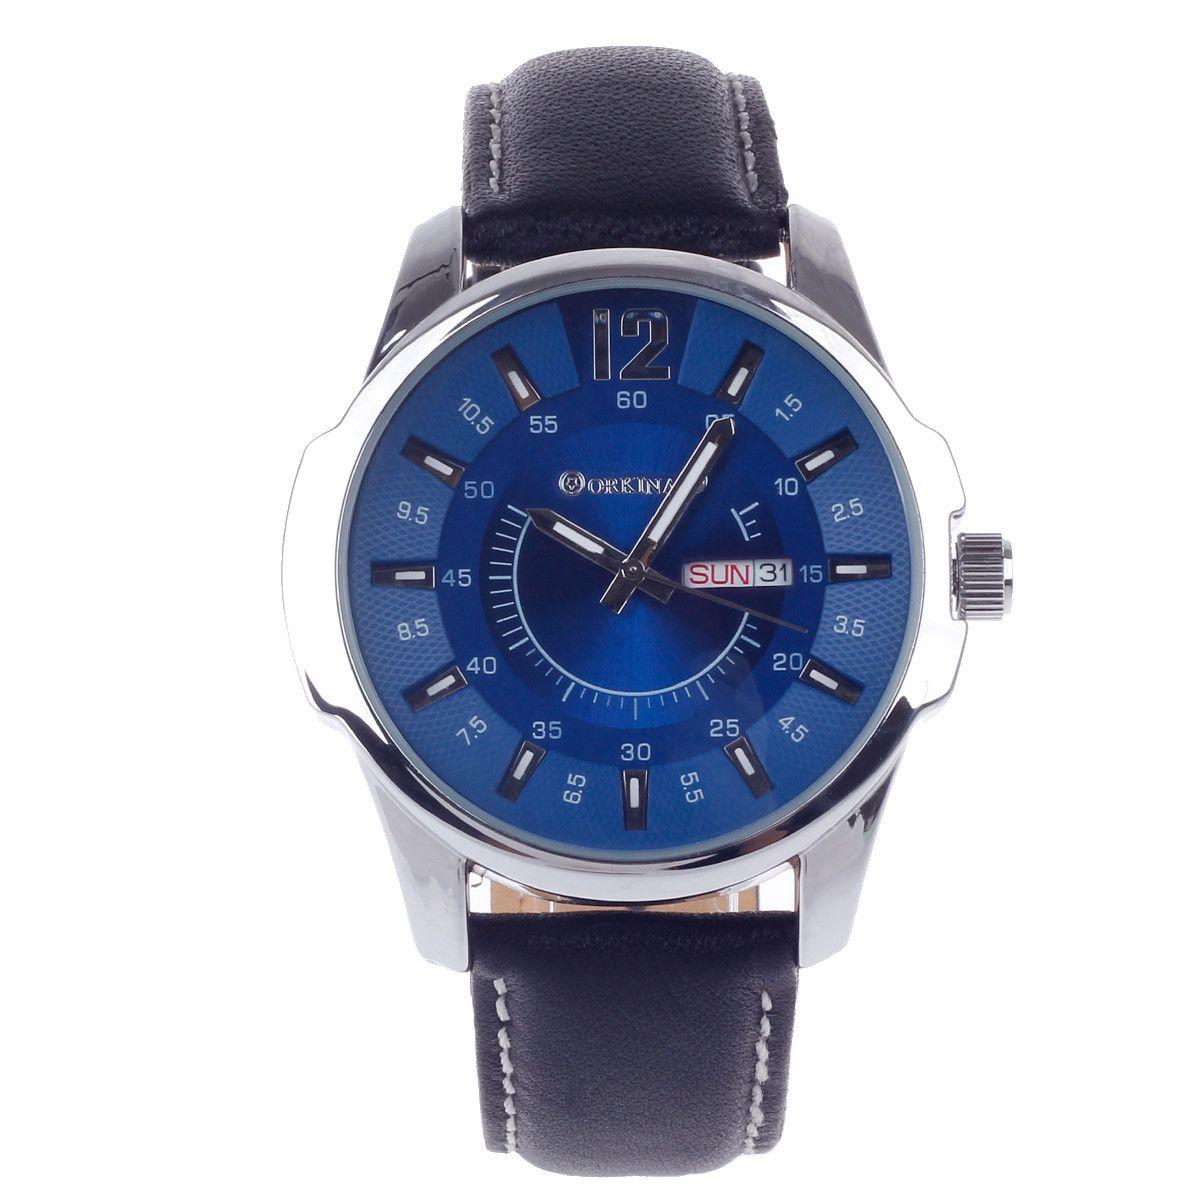 ORKINA W003 Fashionable Simple Calendar Men's Quartz Analog Wrist Watch